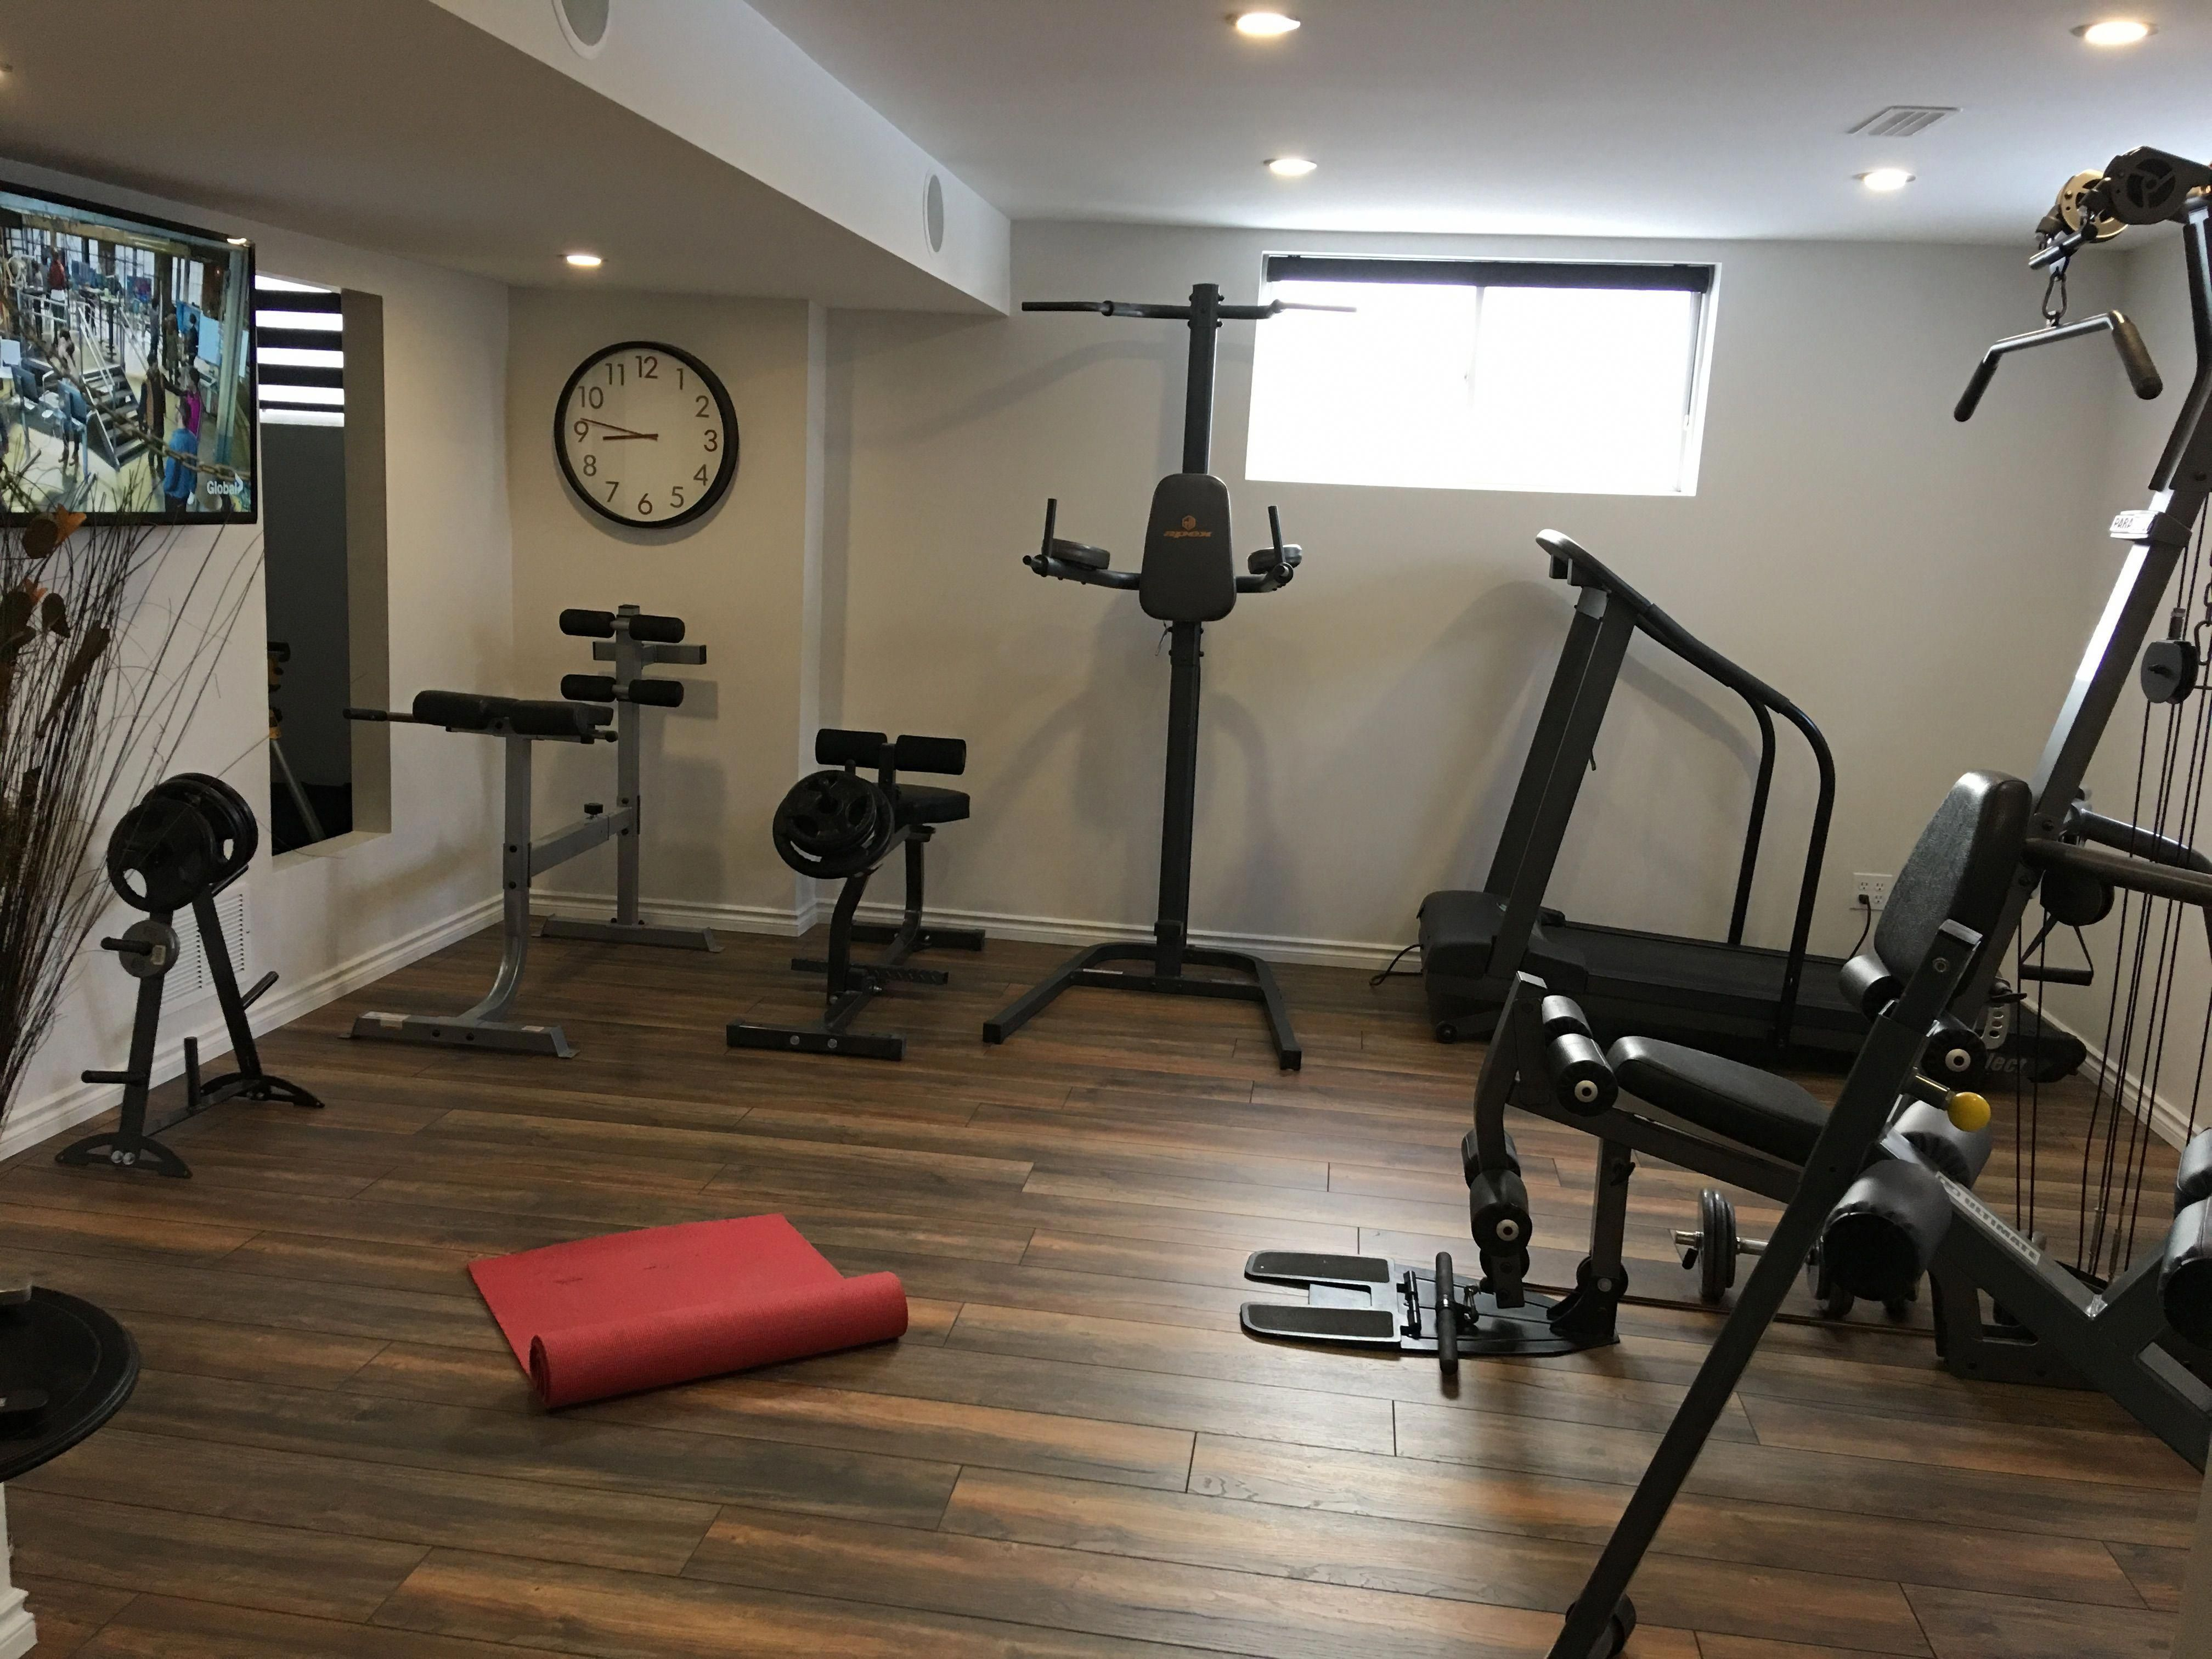 Low Ceilling Basement Low Ceiling Home Gym Decor Home Gym Design